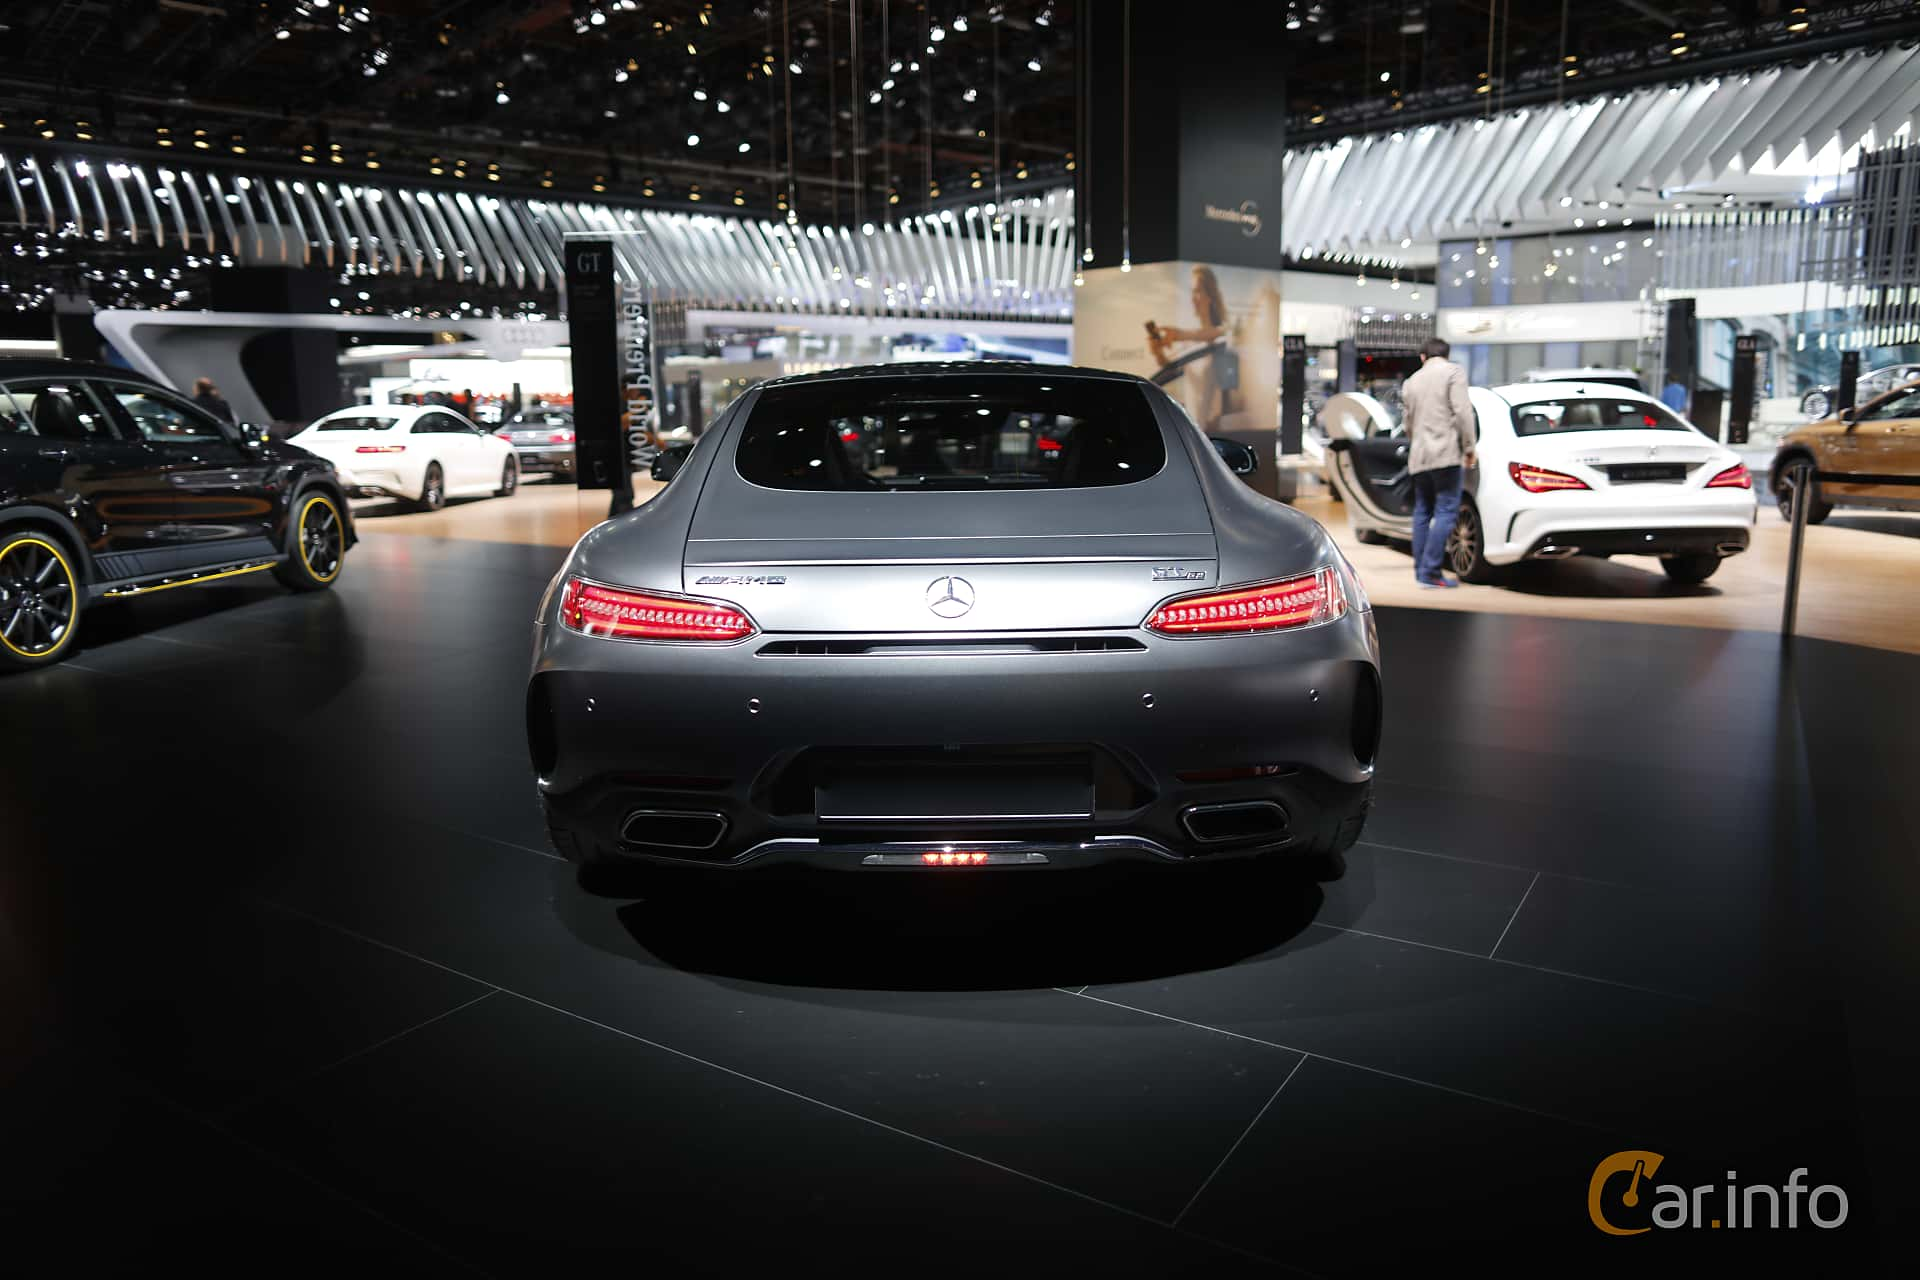 Mercedes benz amg gt c 4 0 v8 amg speedshift dct 557hp for International mercedes benz